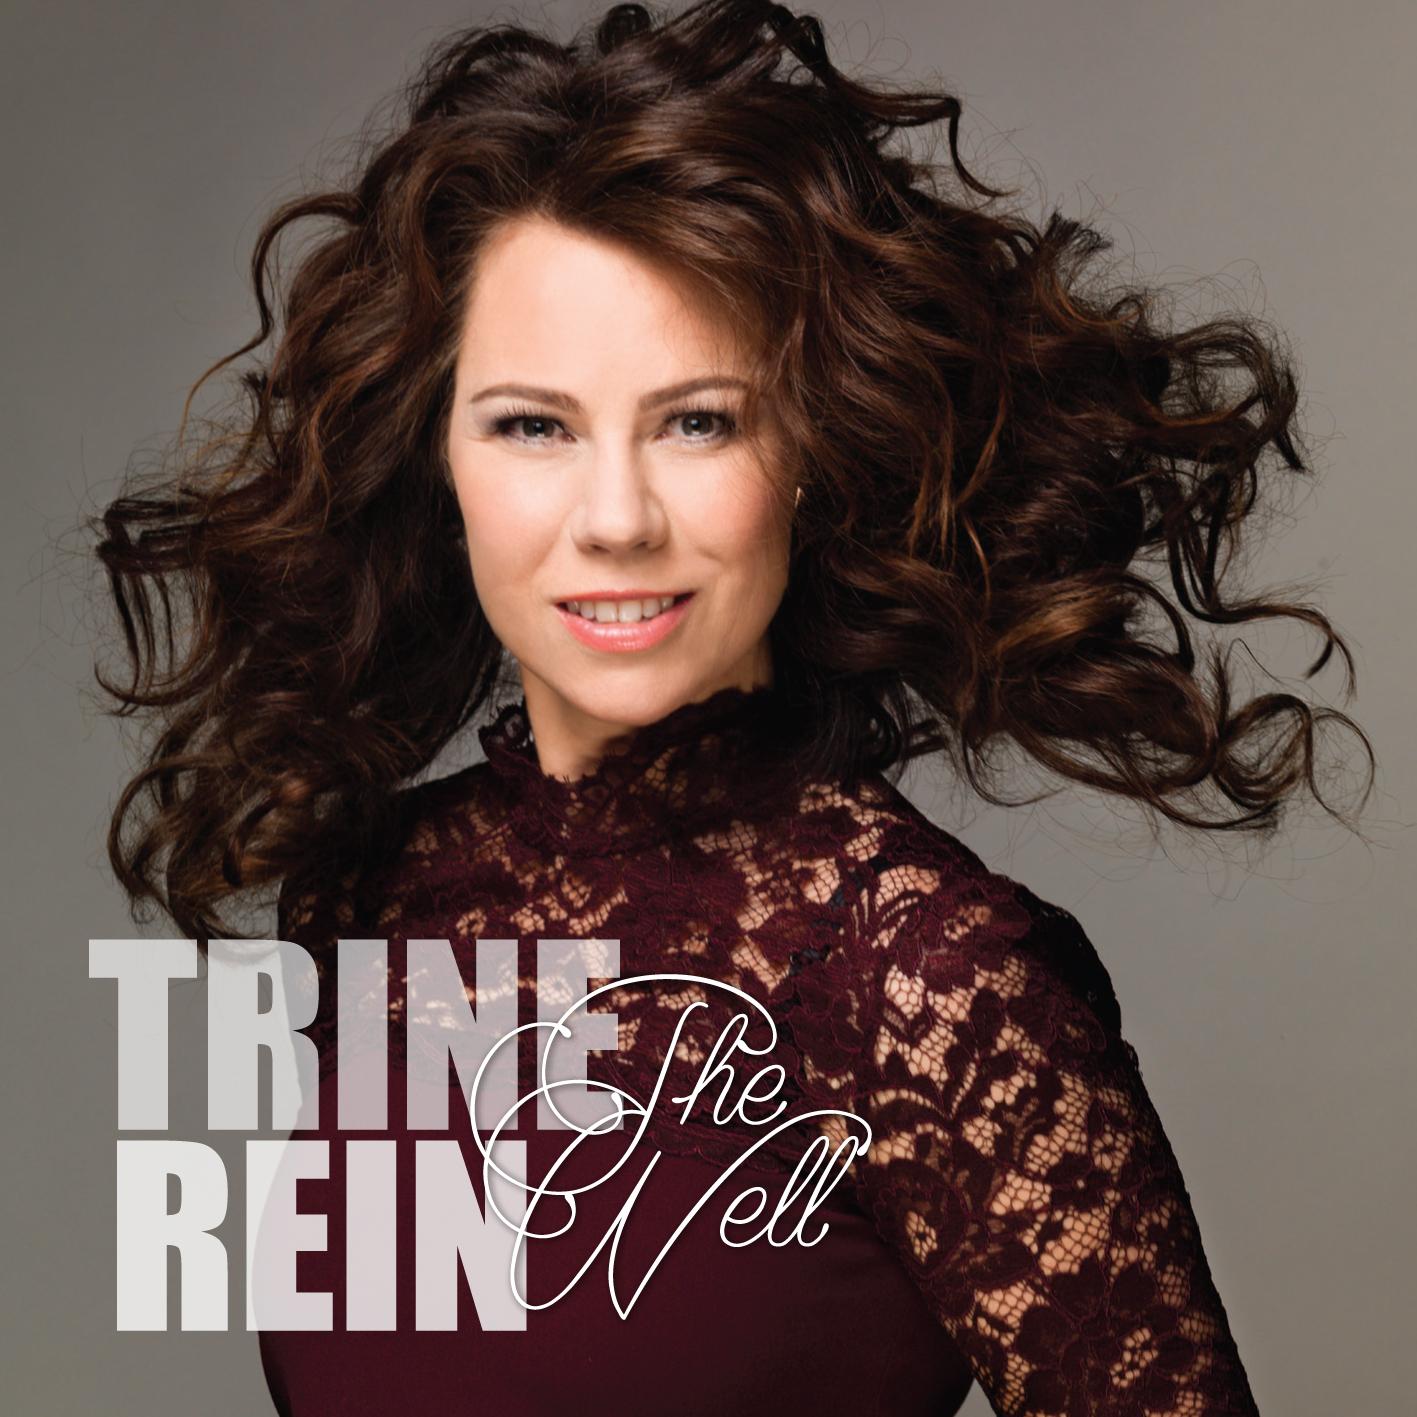 Trine2017CDFront4c.jpg